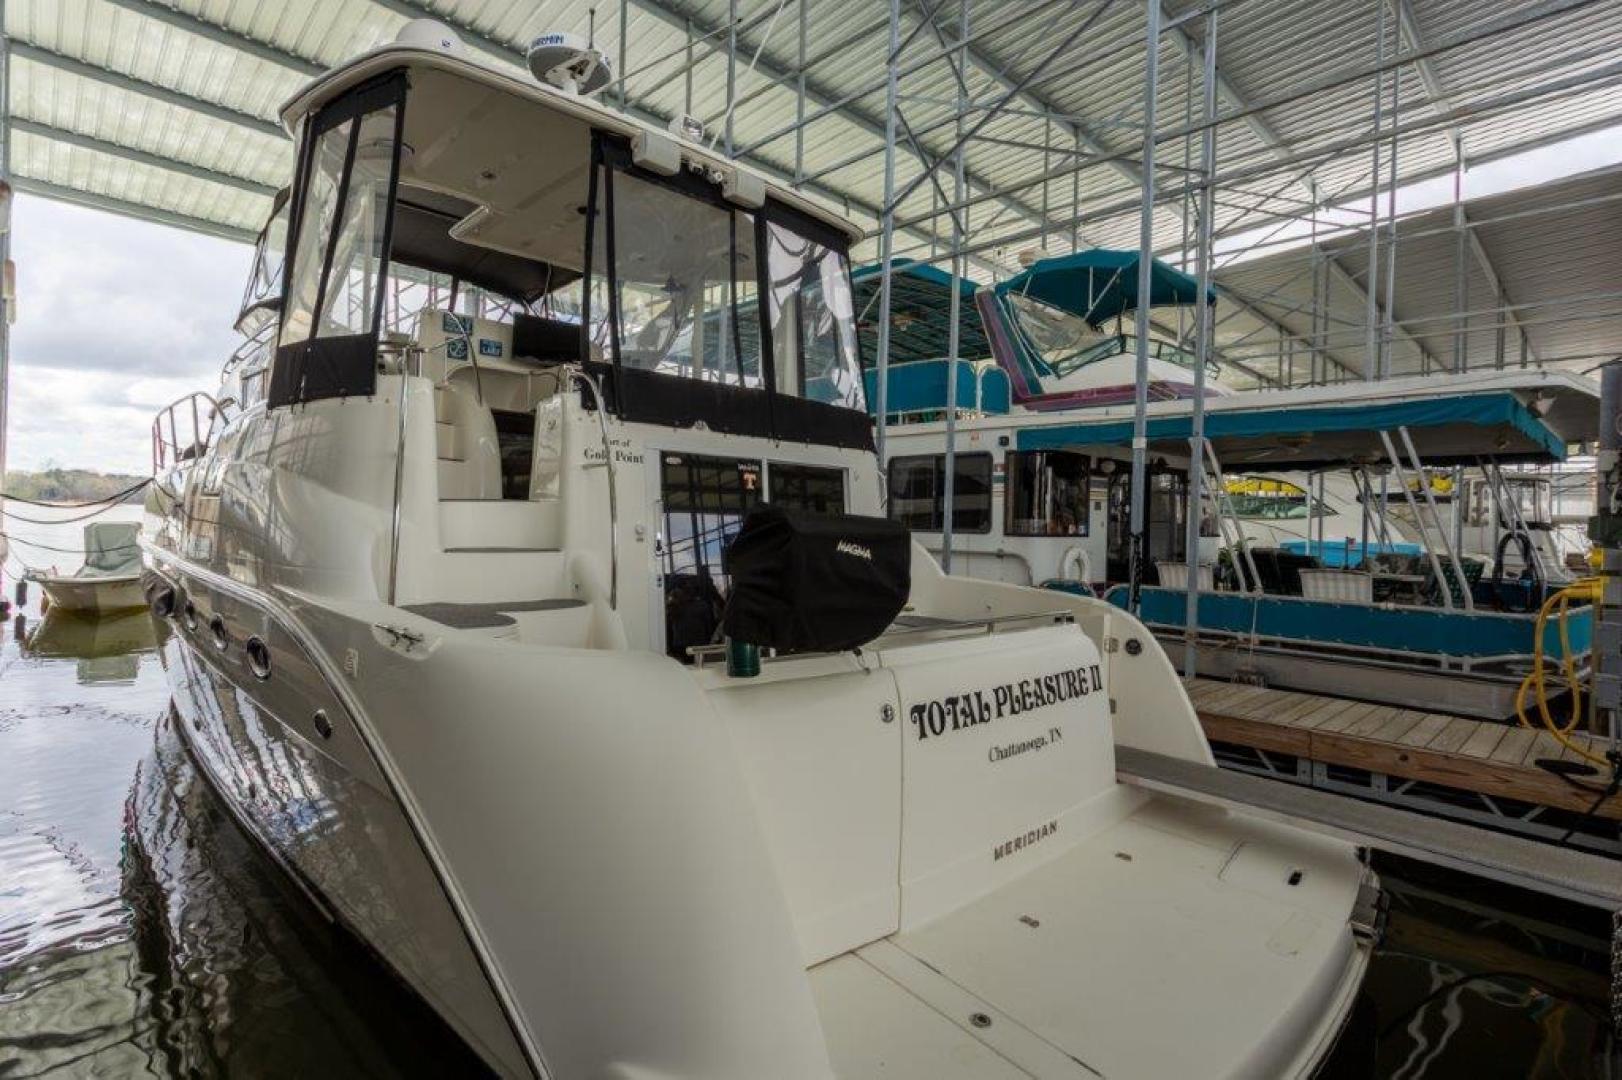 Meridian-459 Motoryacht 2004-Total Pleasure Chattanooga-Tennessee-United States-553063 | Thumbnail